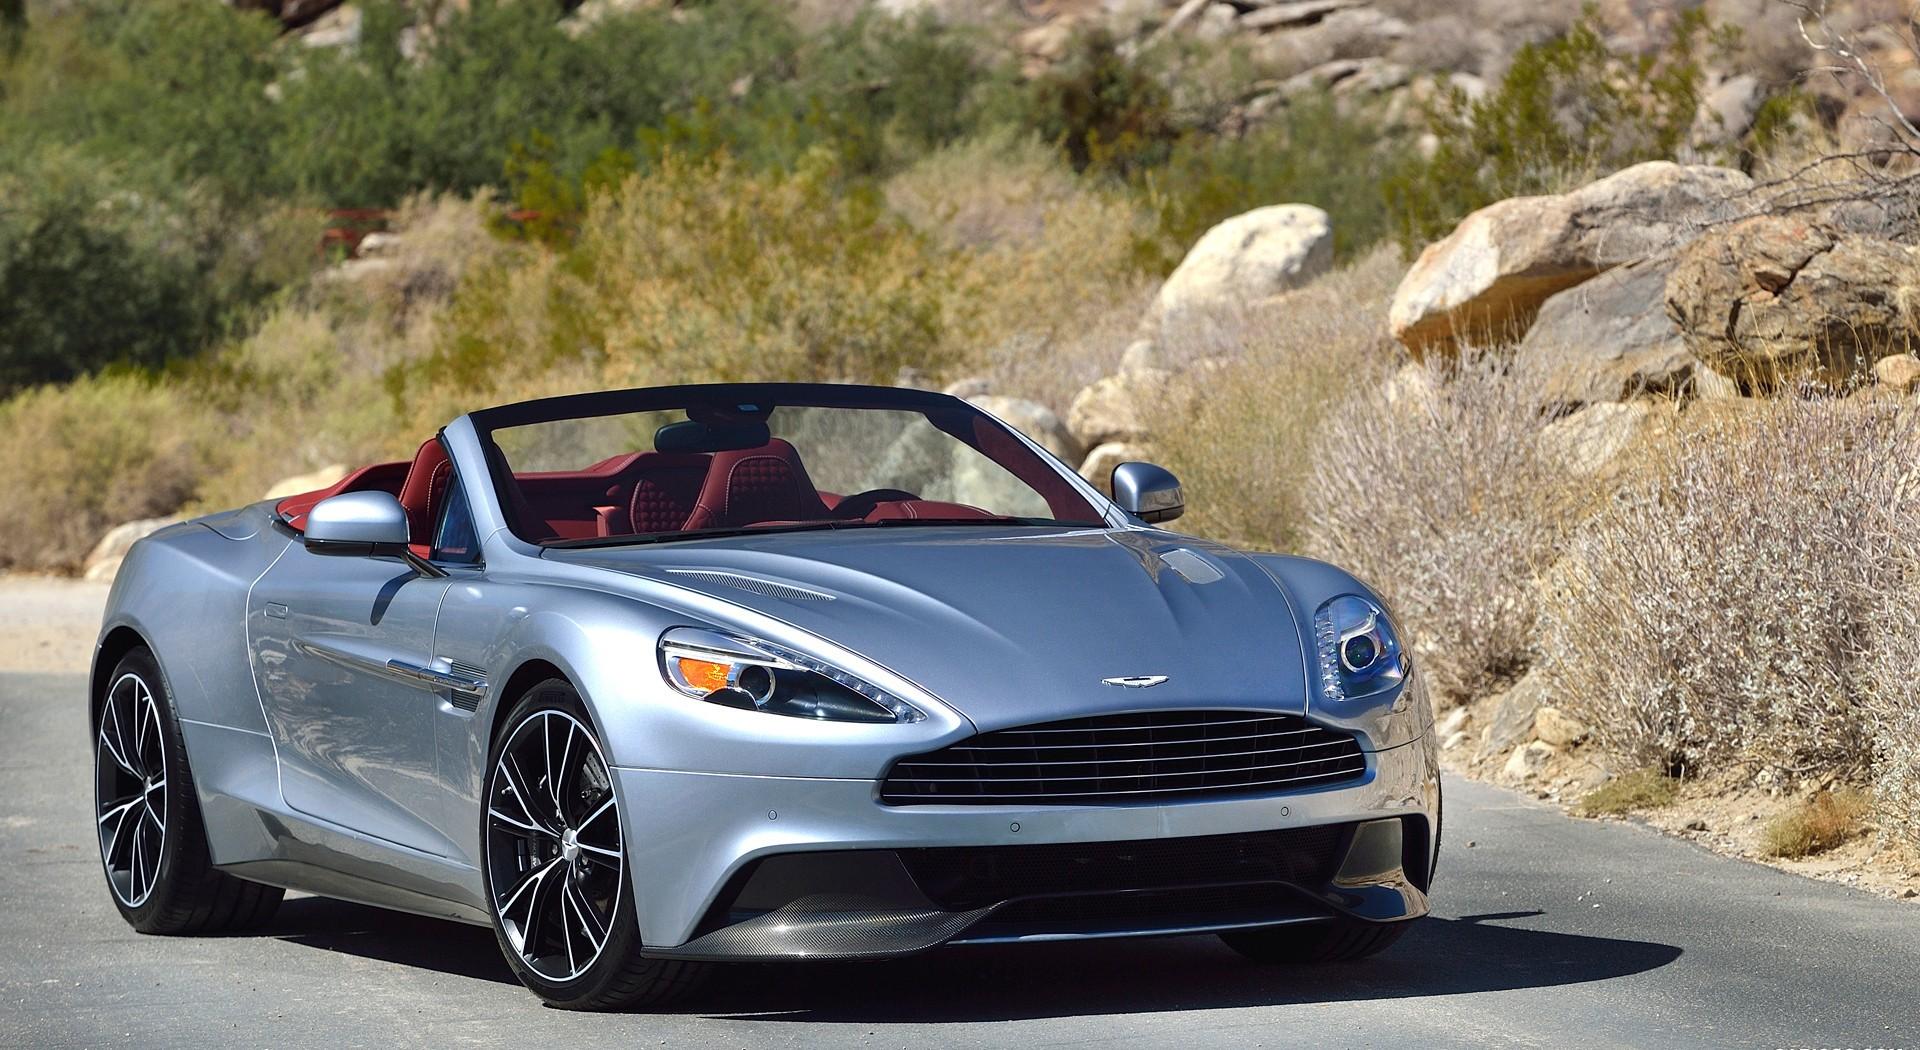 Aston Martin Vanquish roadside